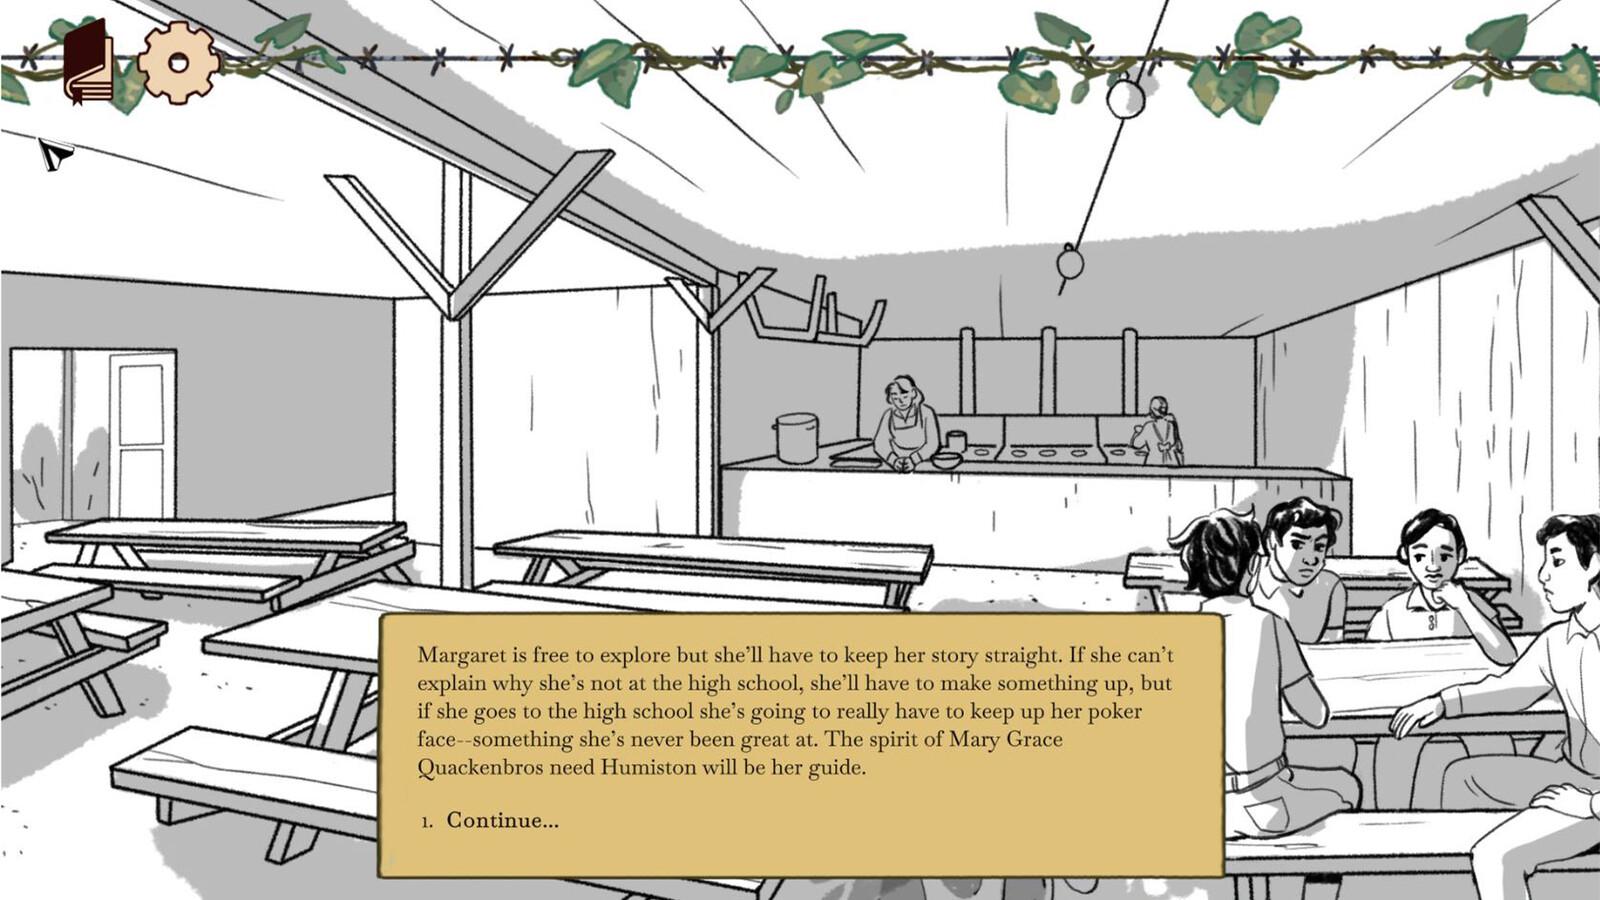 Scene 9 - Margaret investigates conditions at the Rhower internment camp.